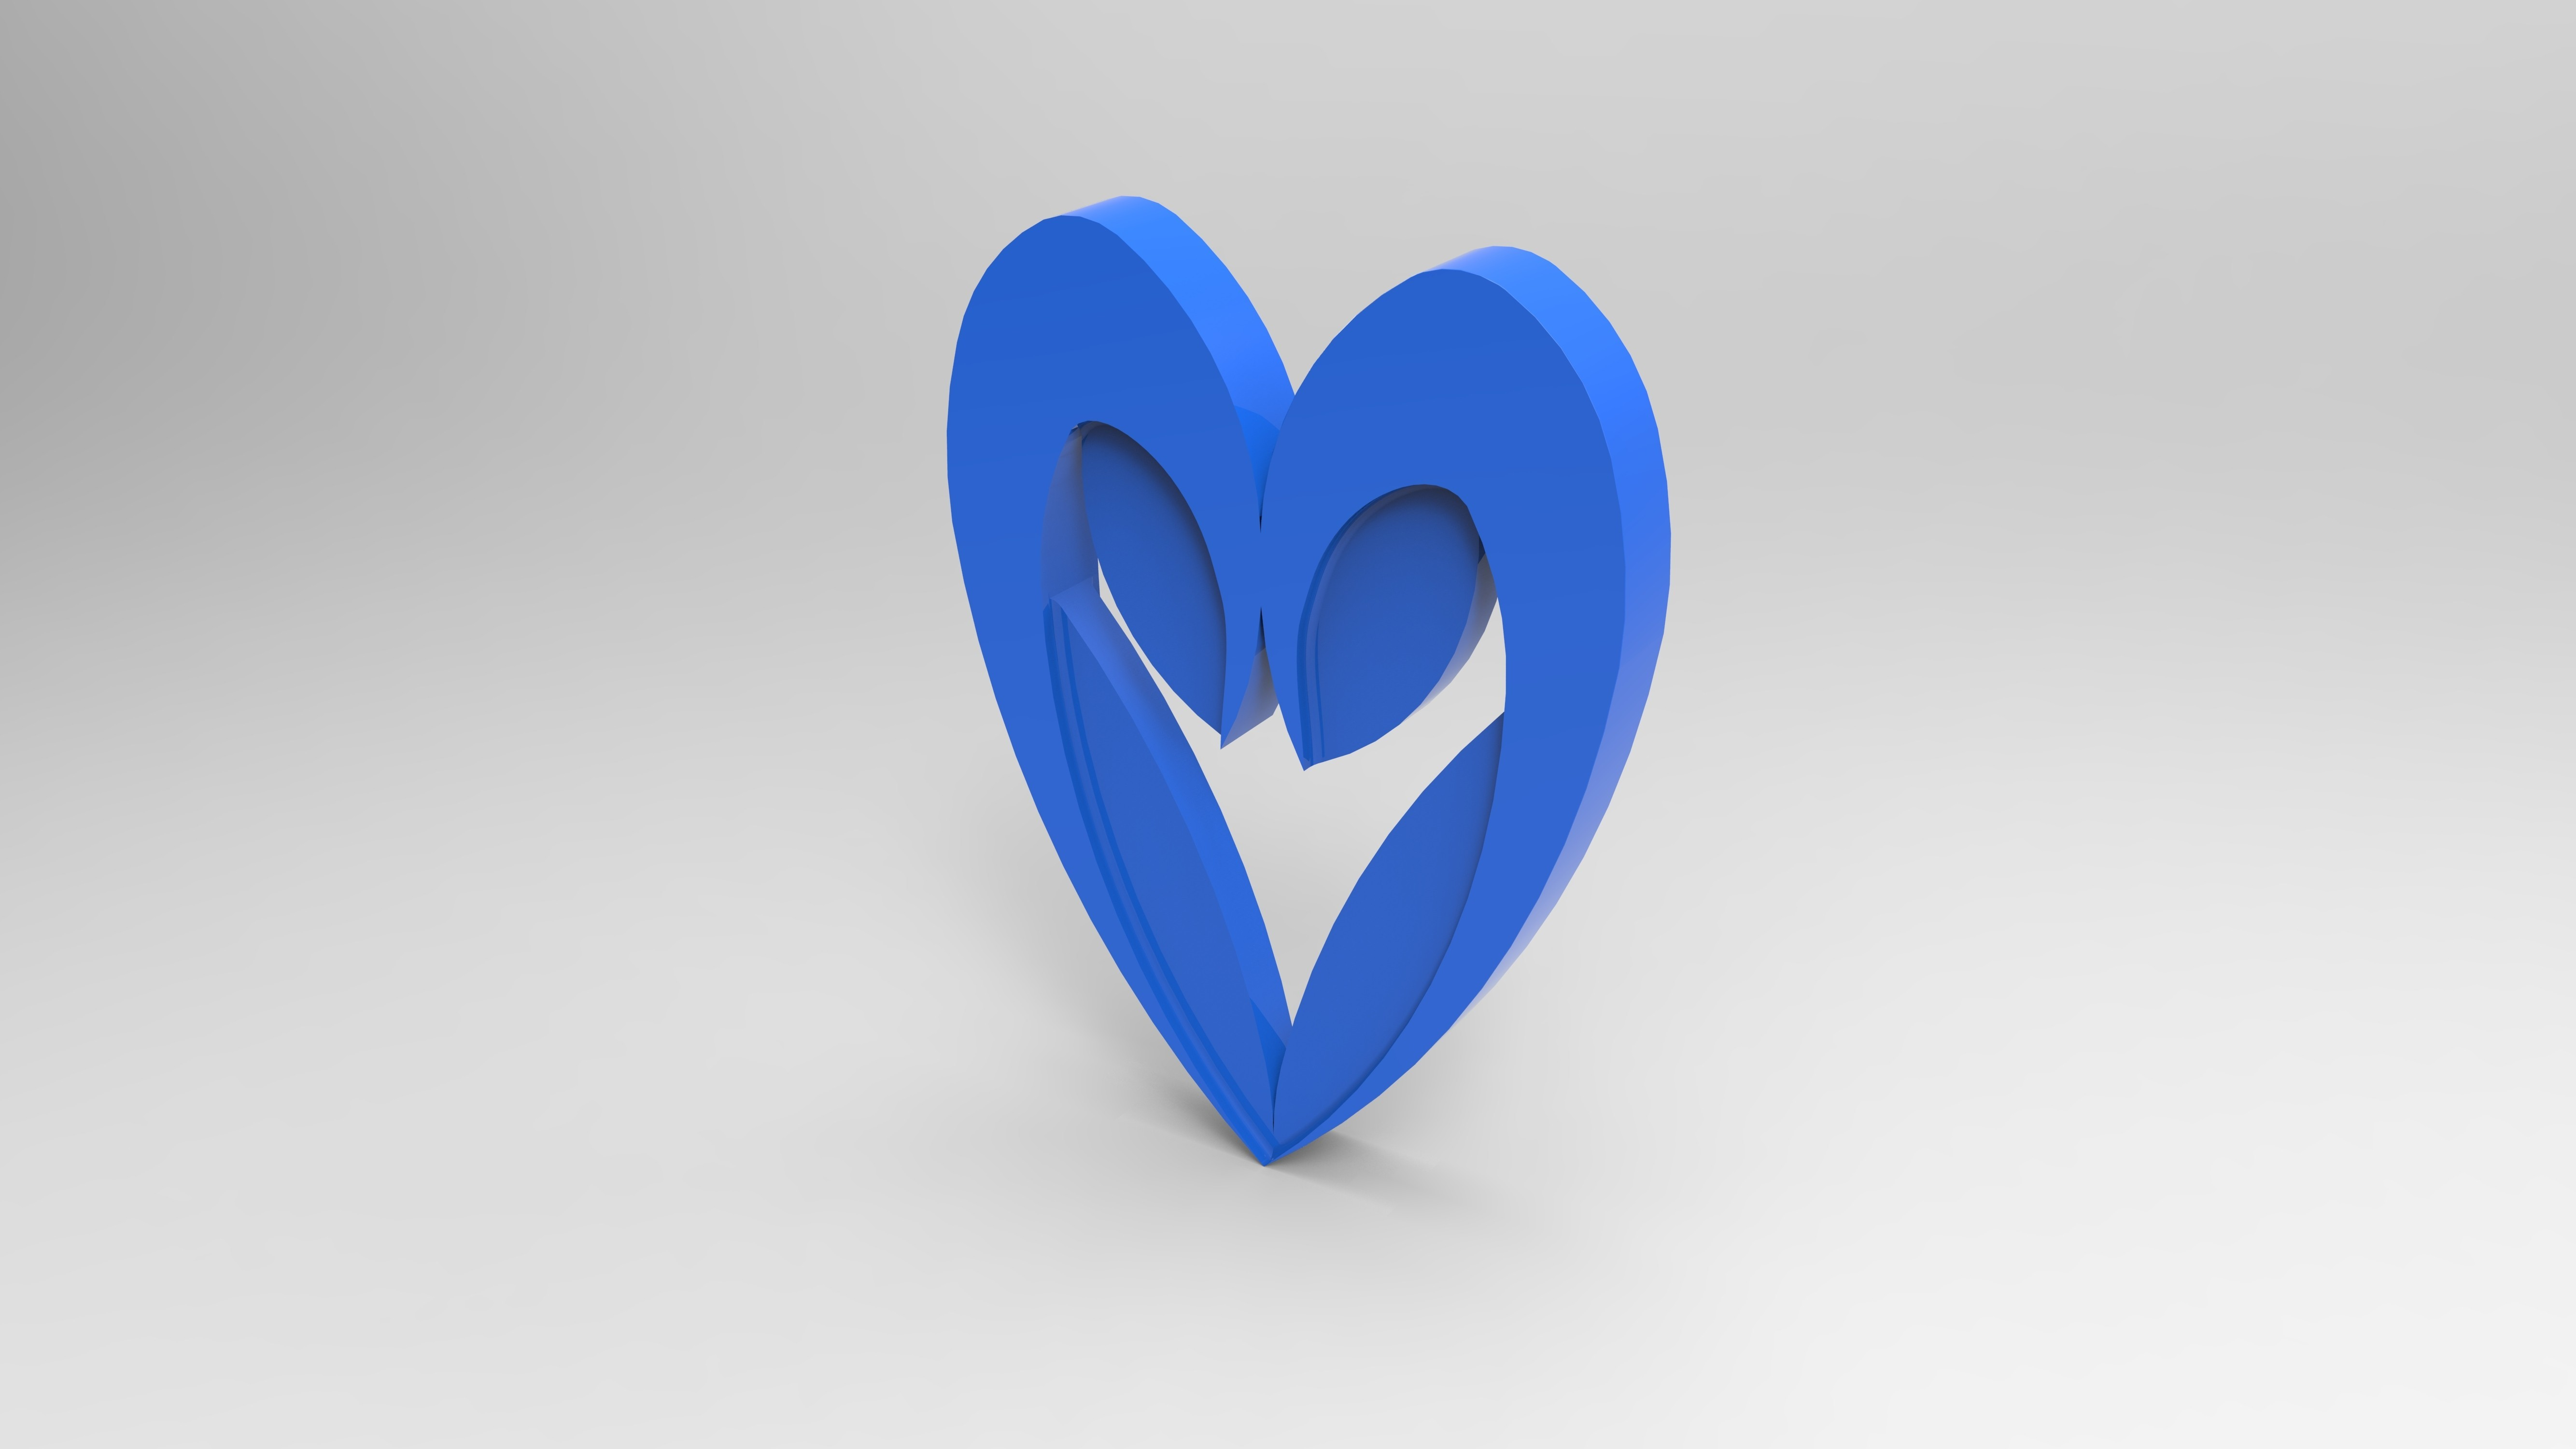 rendu simple bleu.160.jpg Download free STL file Heart from the stratomaker logo • 3D print object, GuilhemPerroud